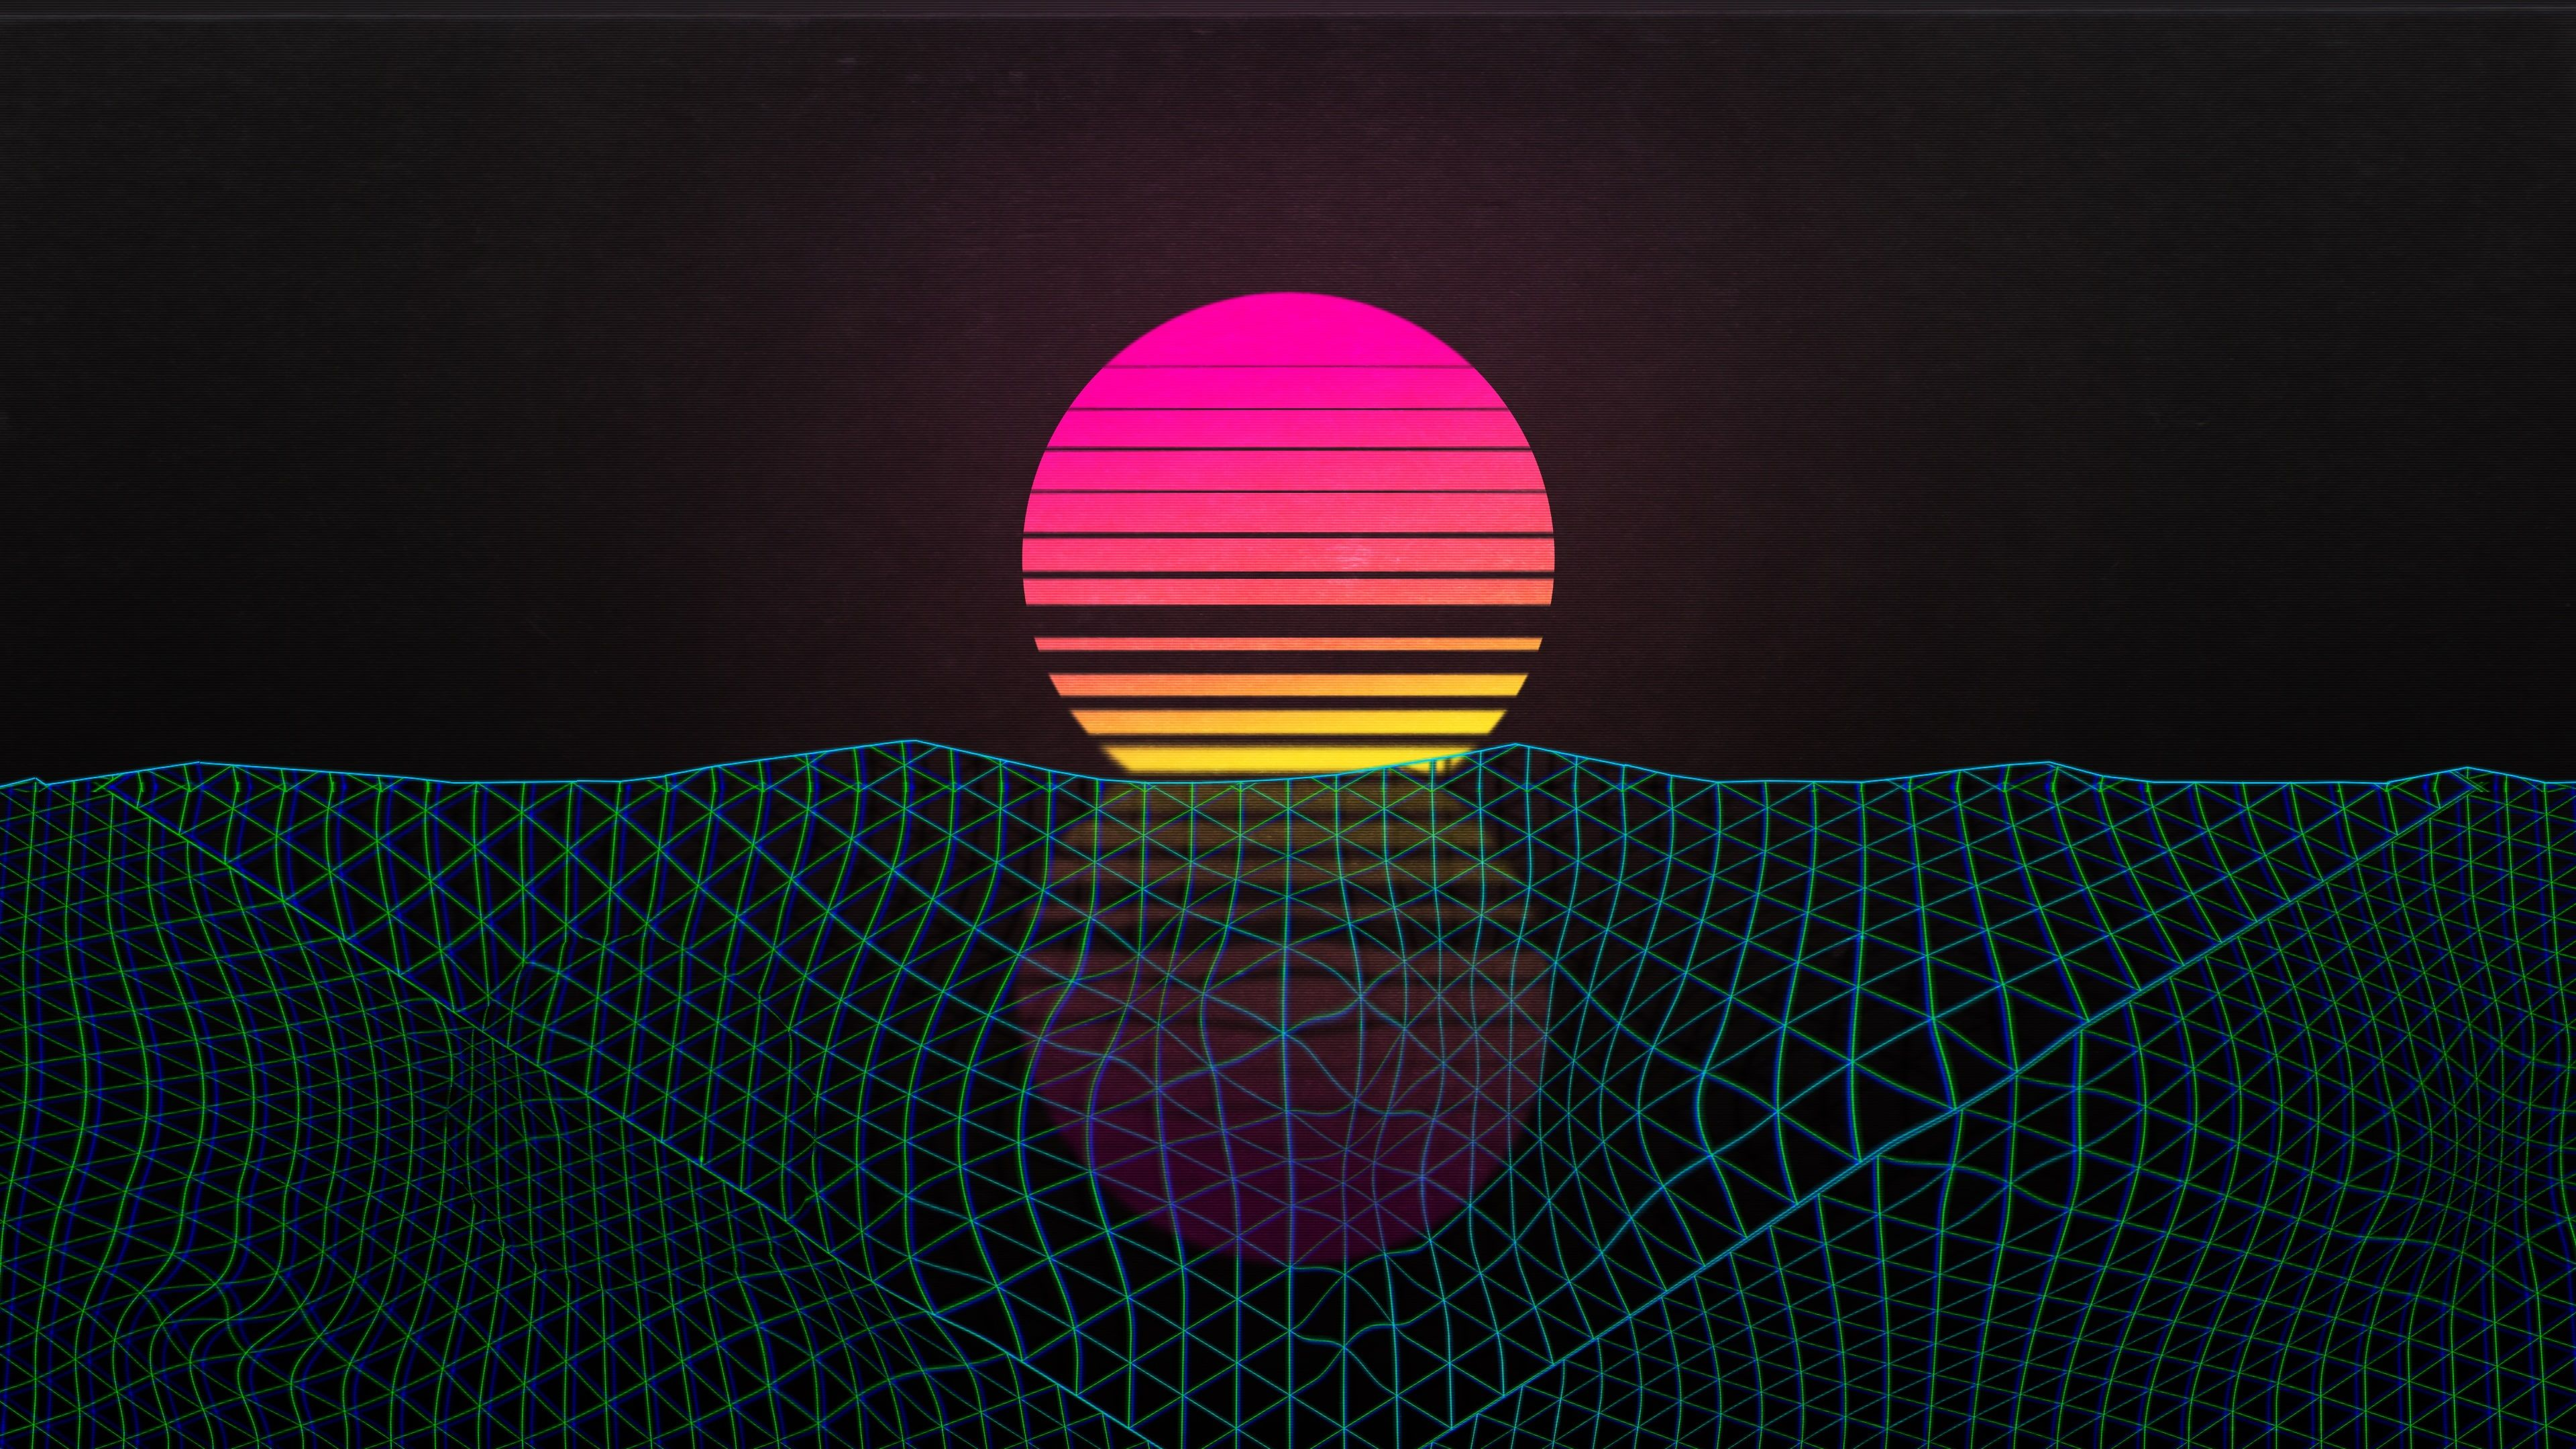 Outrun Sunset Vaporwave 4k Wallpaper Hdwallpaper Desktop Vaporwave Wallpaper Hd Wallpaper Vaporwave